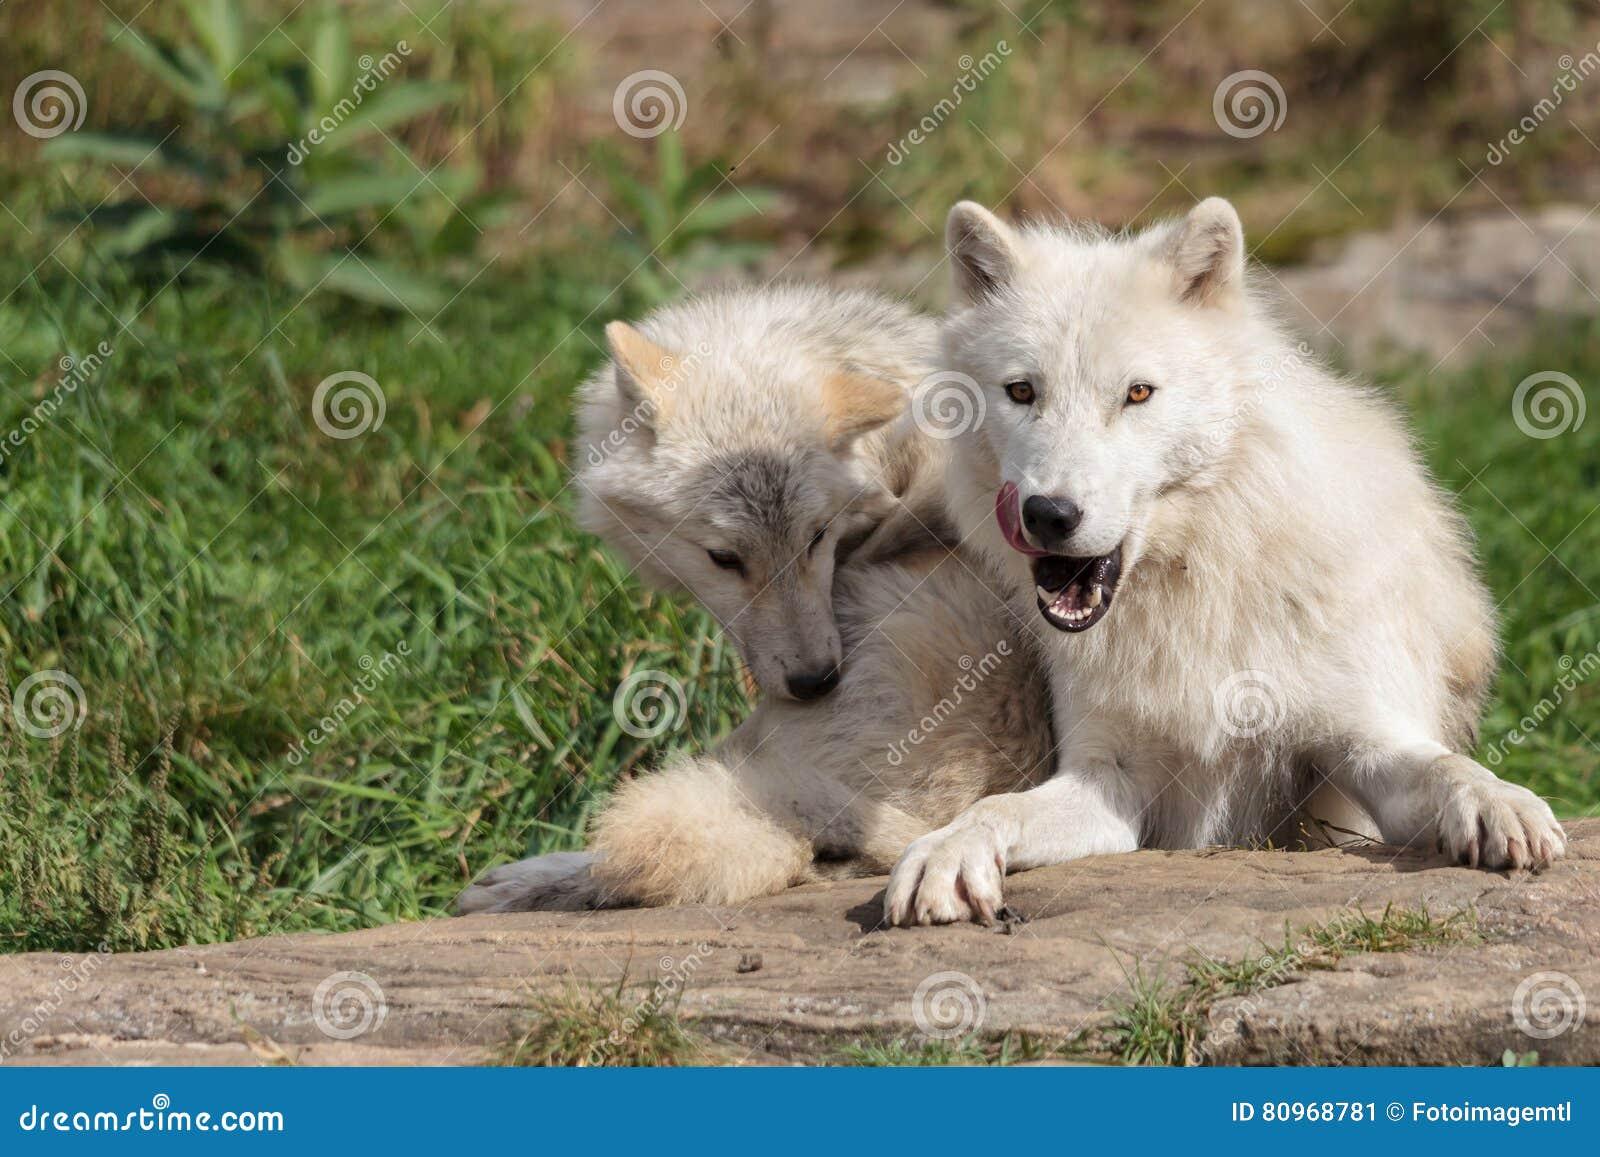 Lobo ártico juvenil com mãe